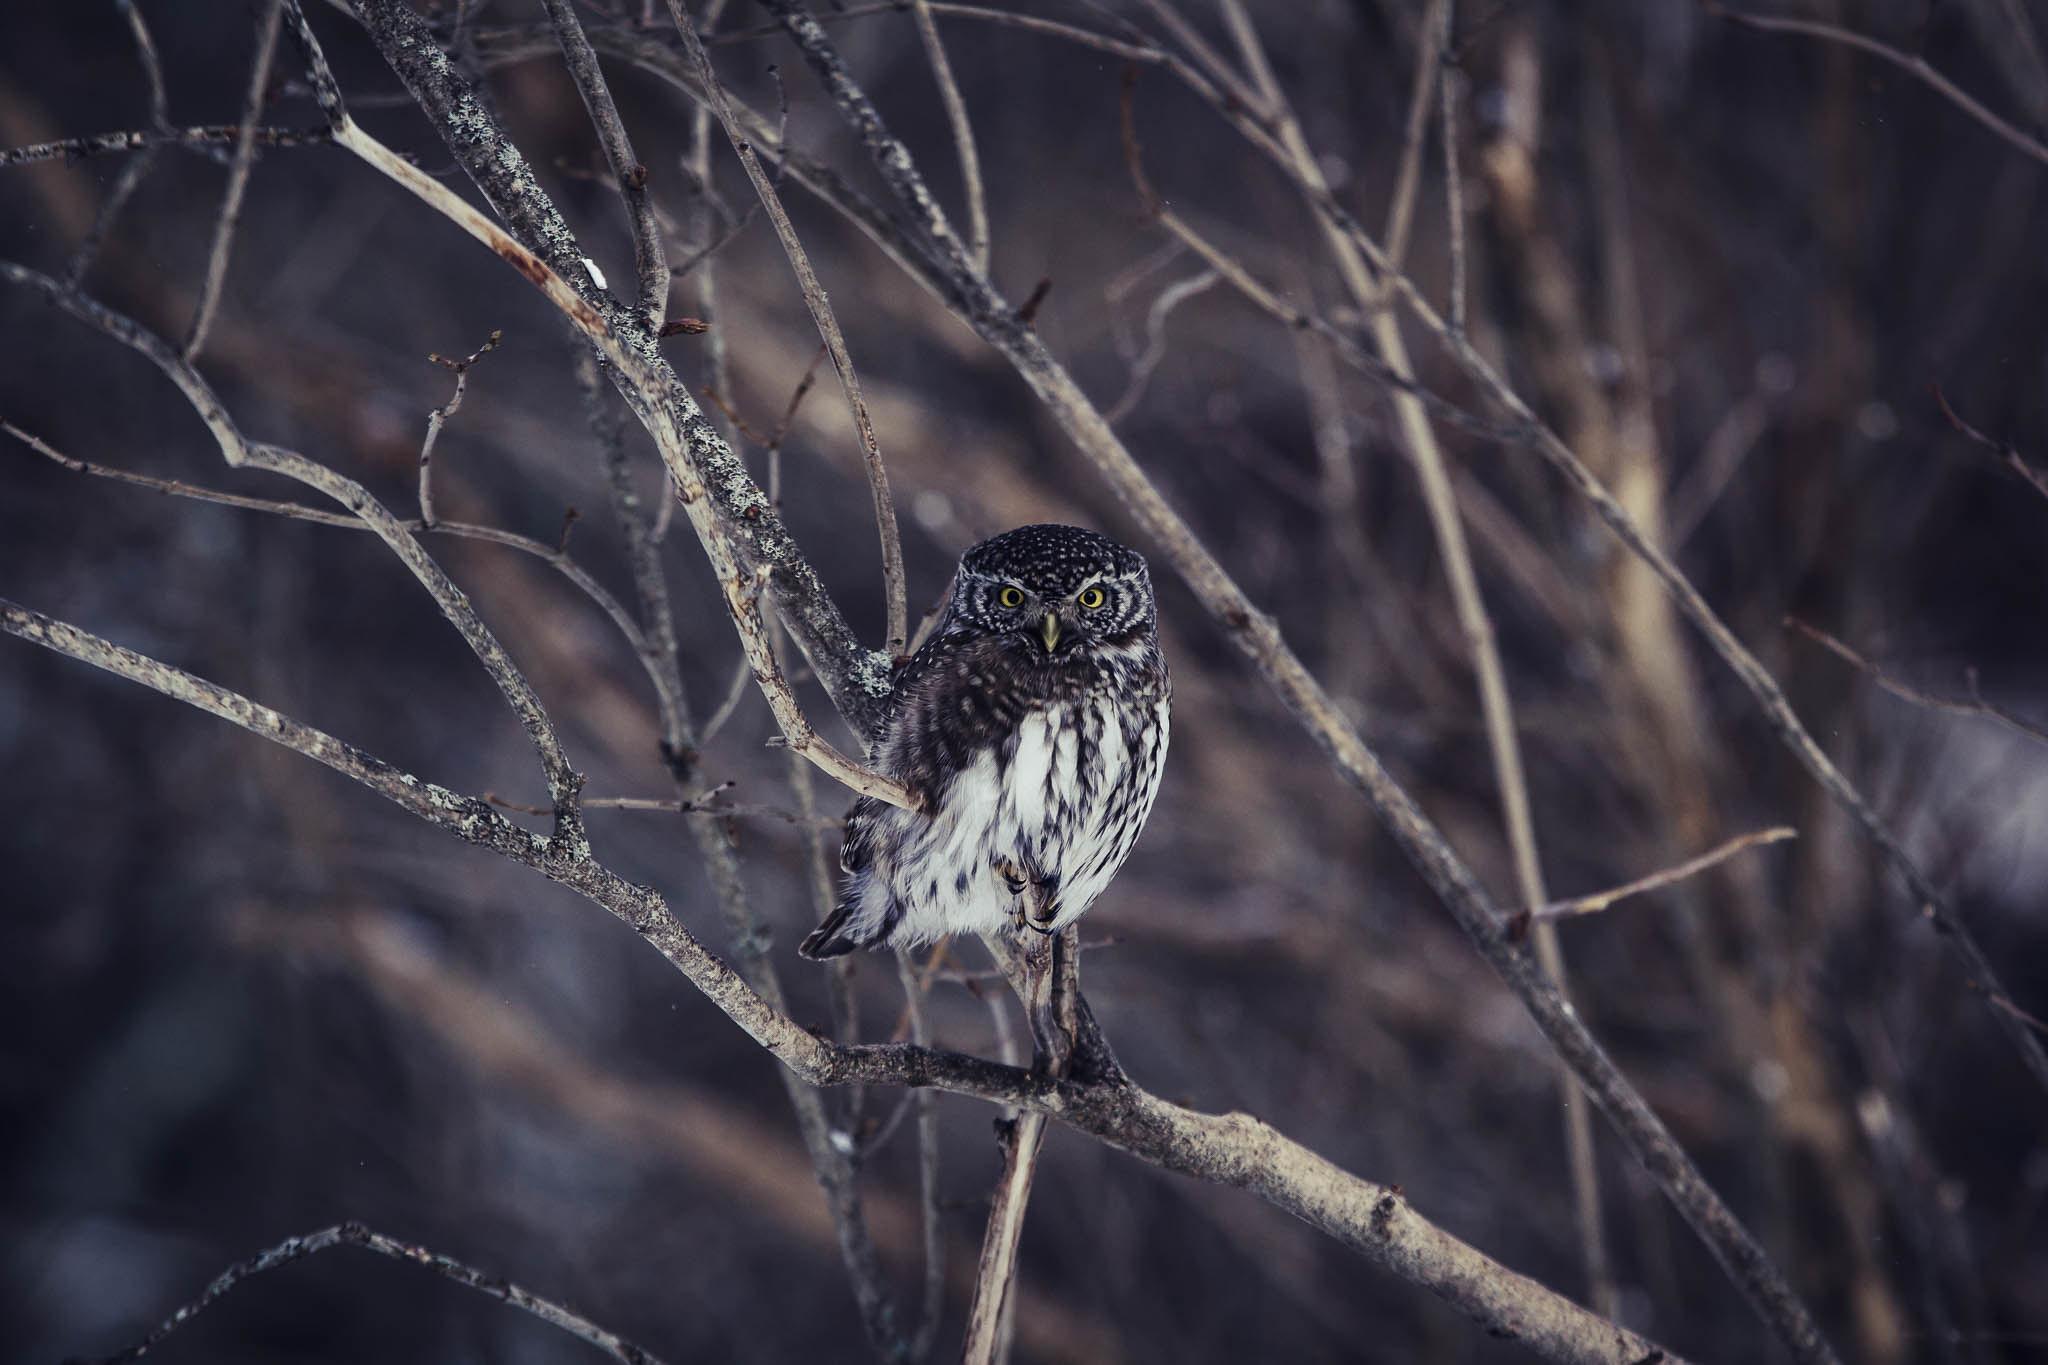 Varpuspöllö / Eurasian pygmy owl